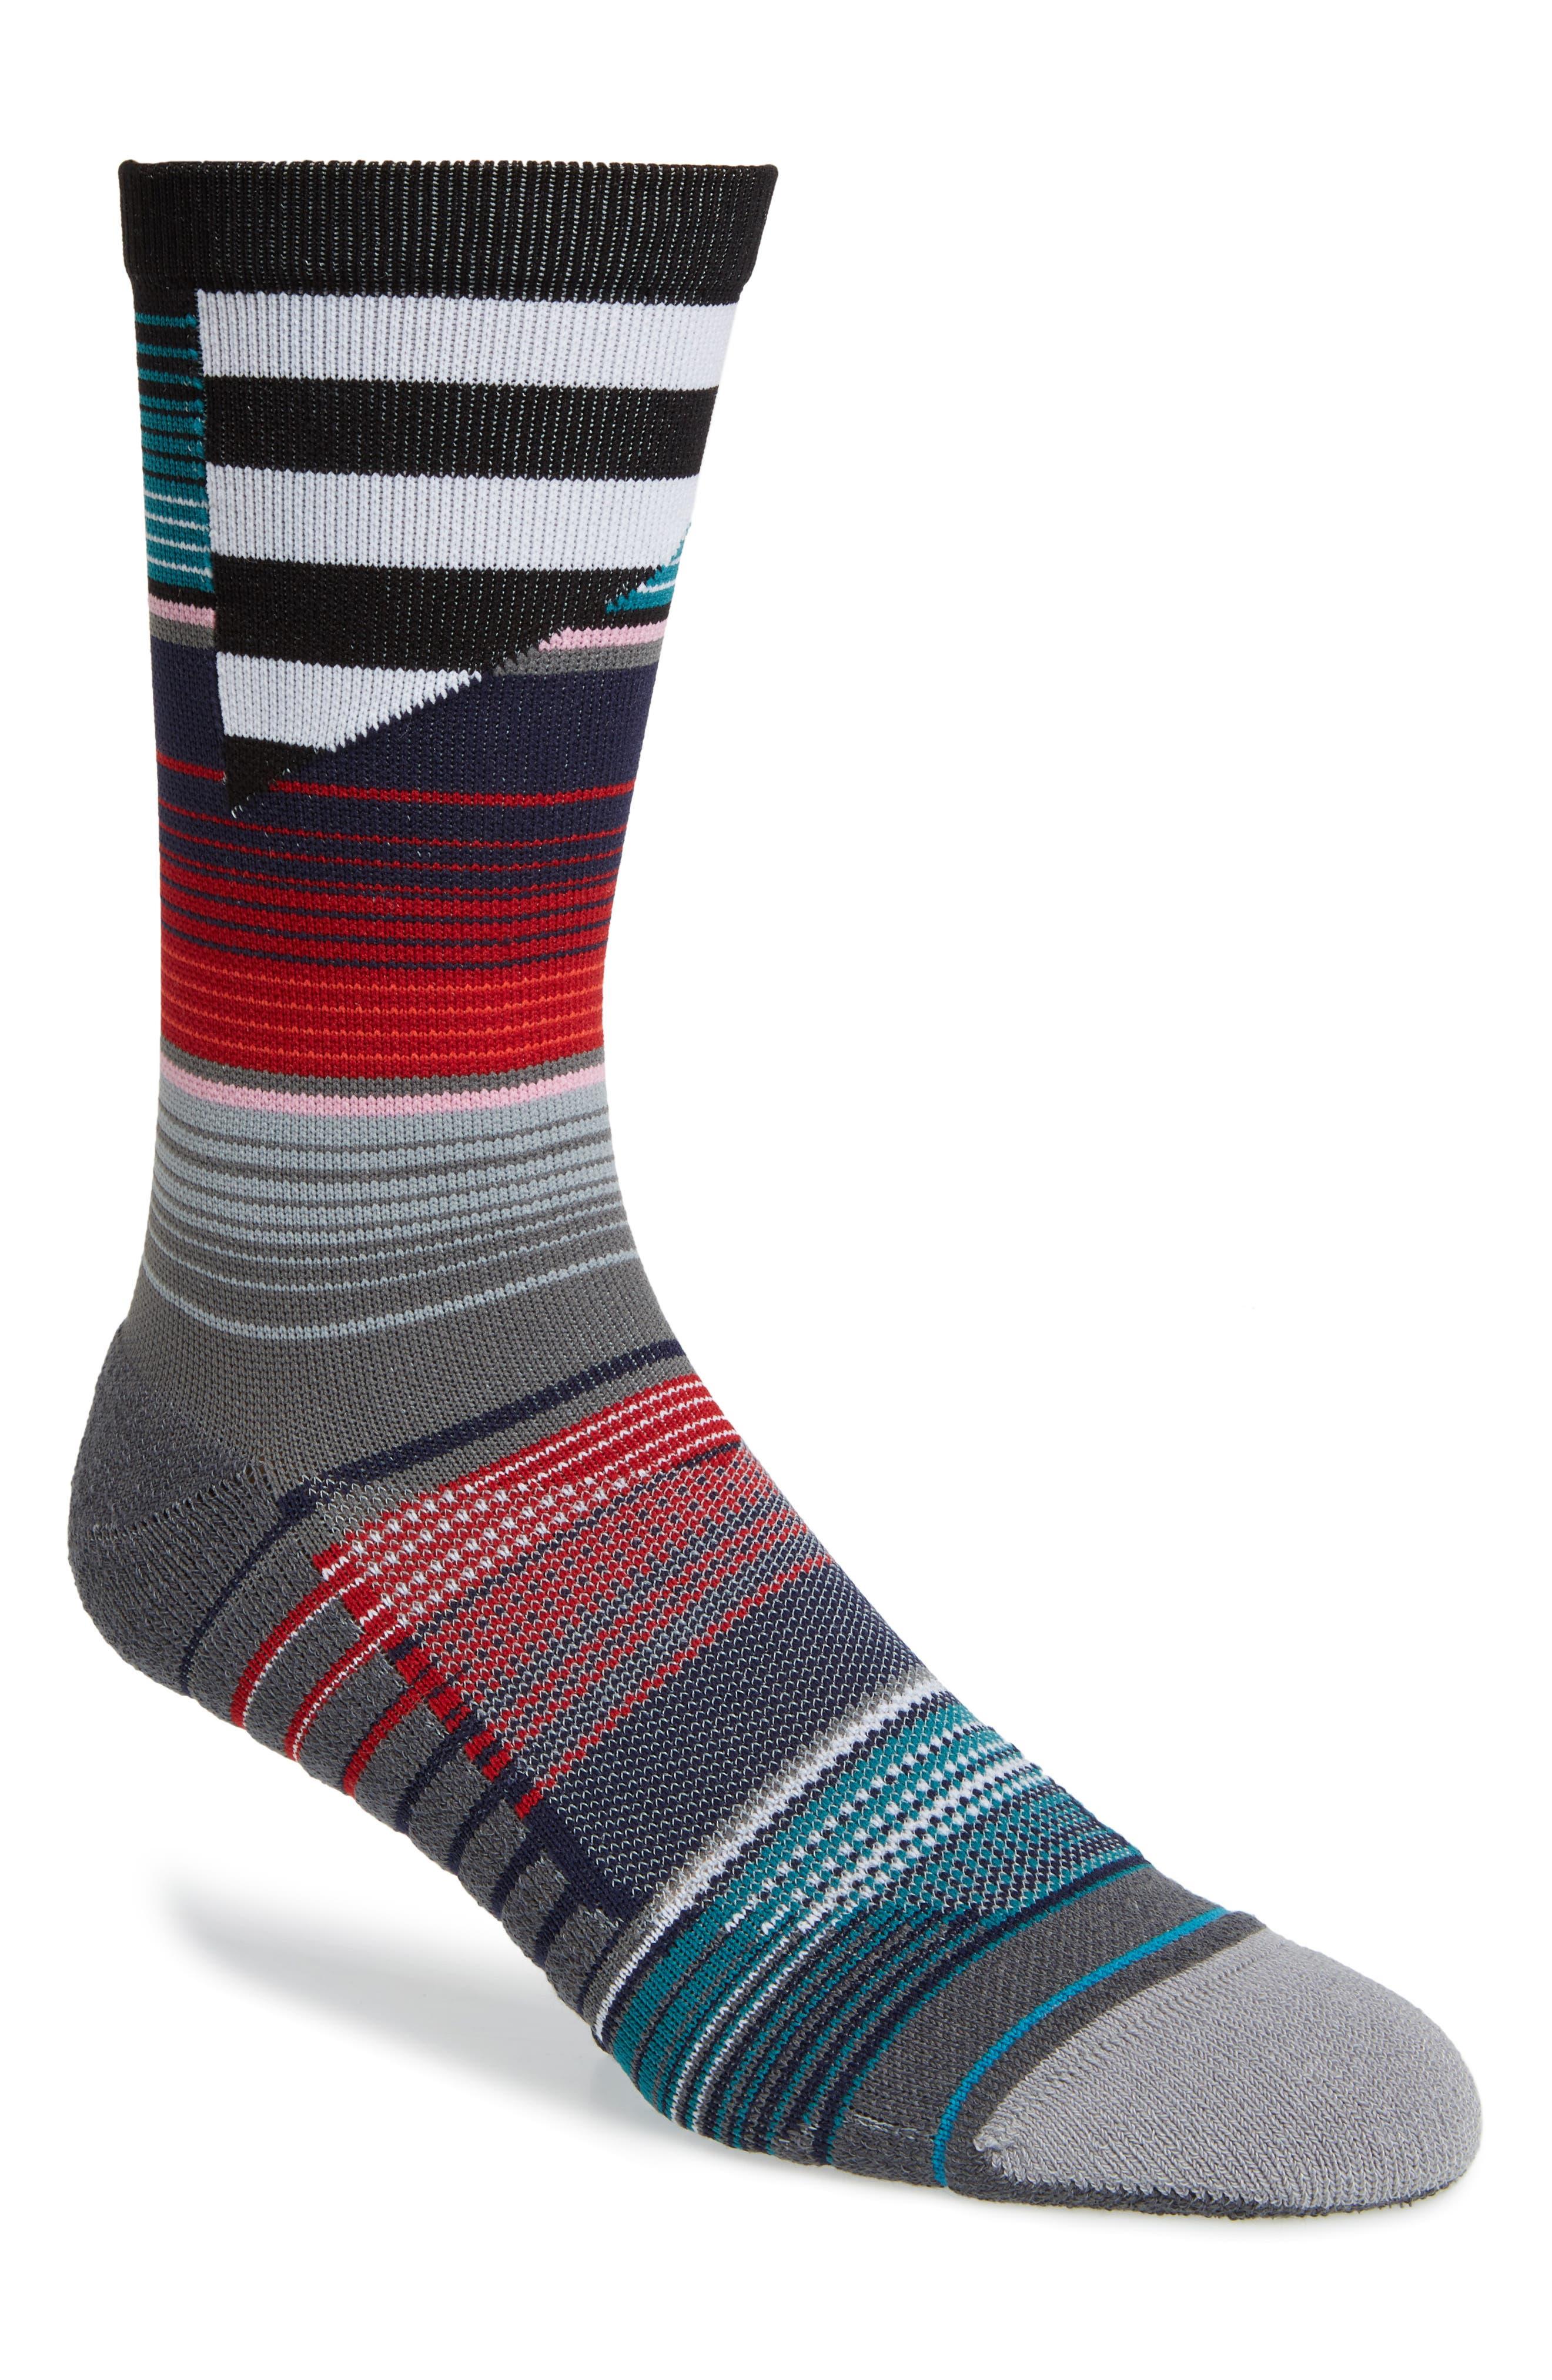 Barder Crew Socks,                             Main thumbnail 1, color,                             Red Multi